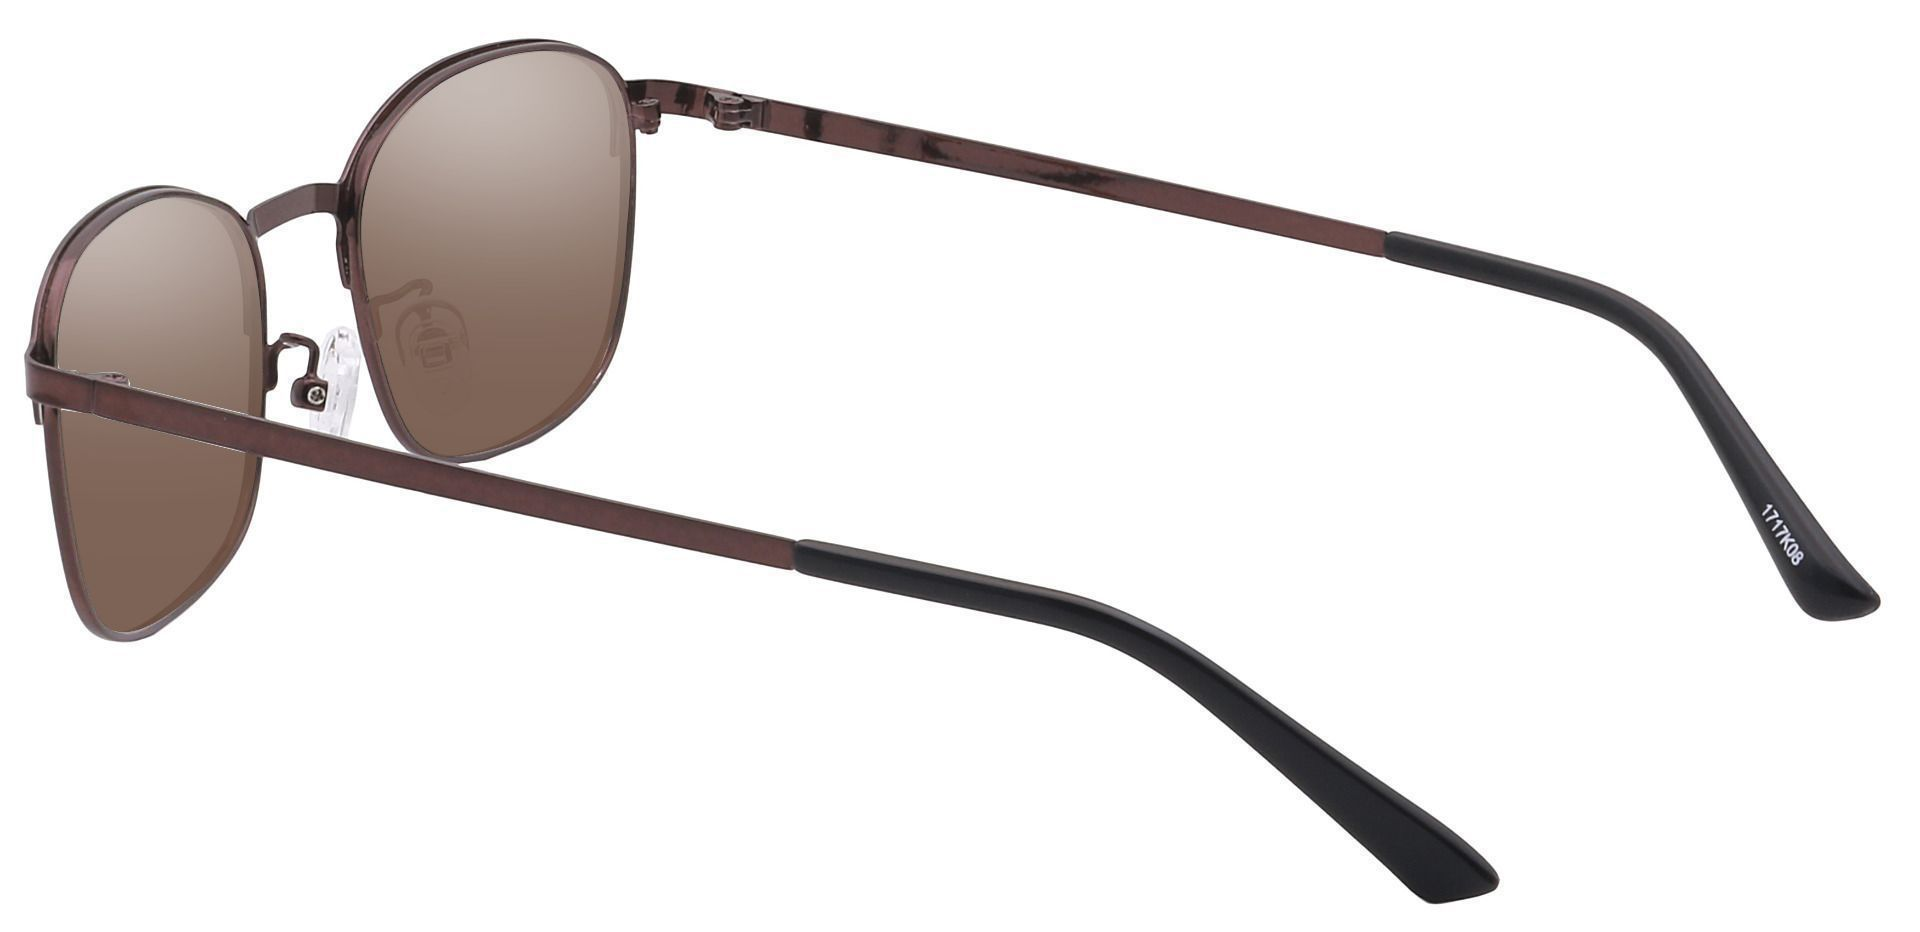 Carmen Square Non-Rx Sunglasses -  Black Frame With Brown Lenses